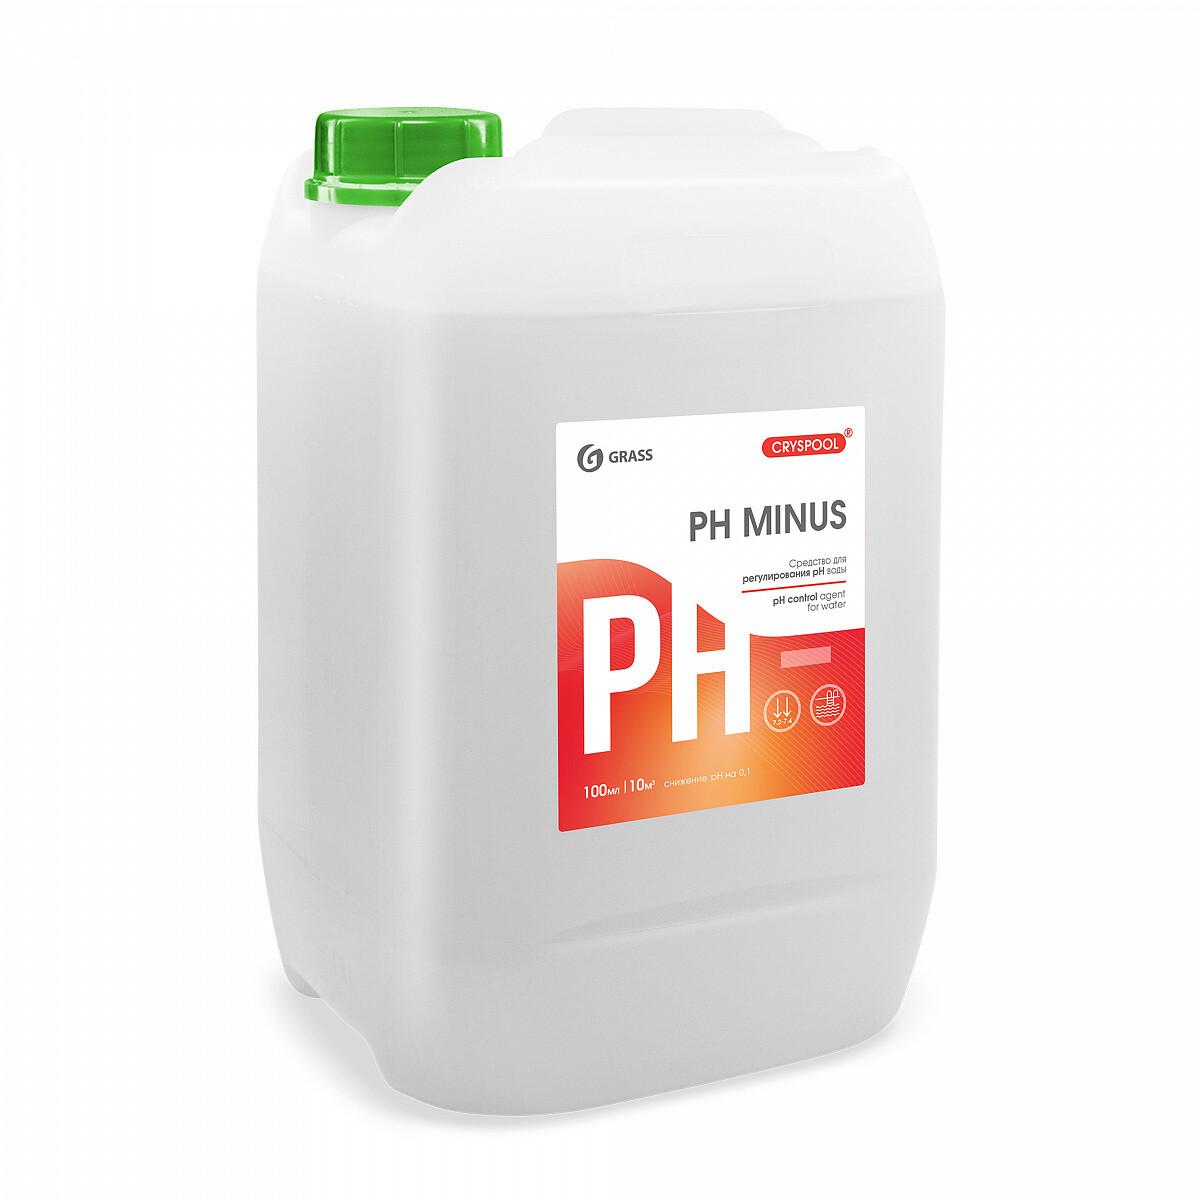 Средство для регулирования pH воды CRYSPOOL pH minus, канистра 12 кг